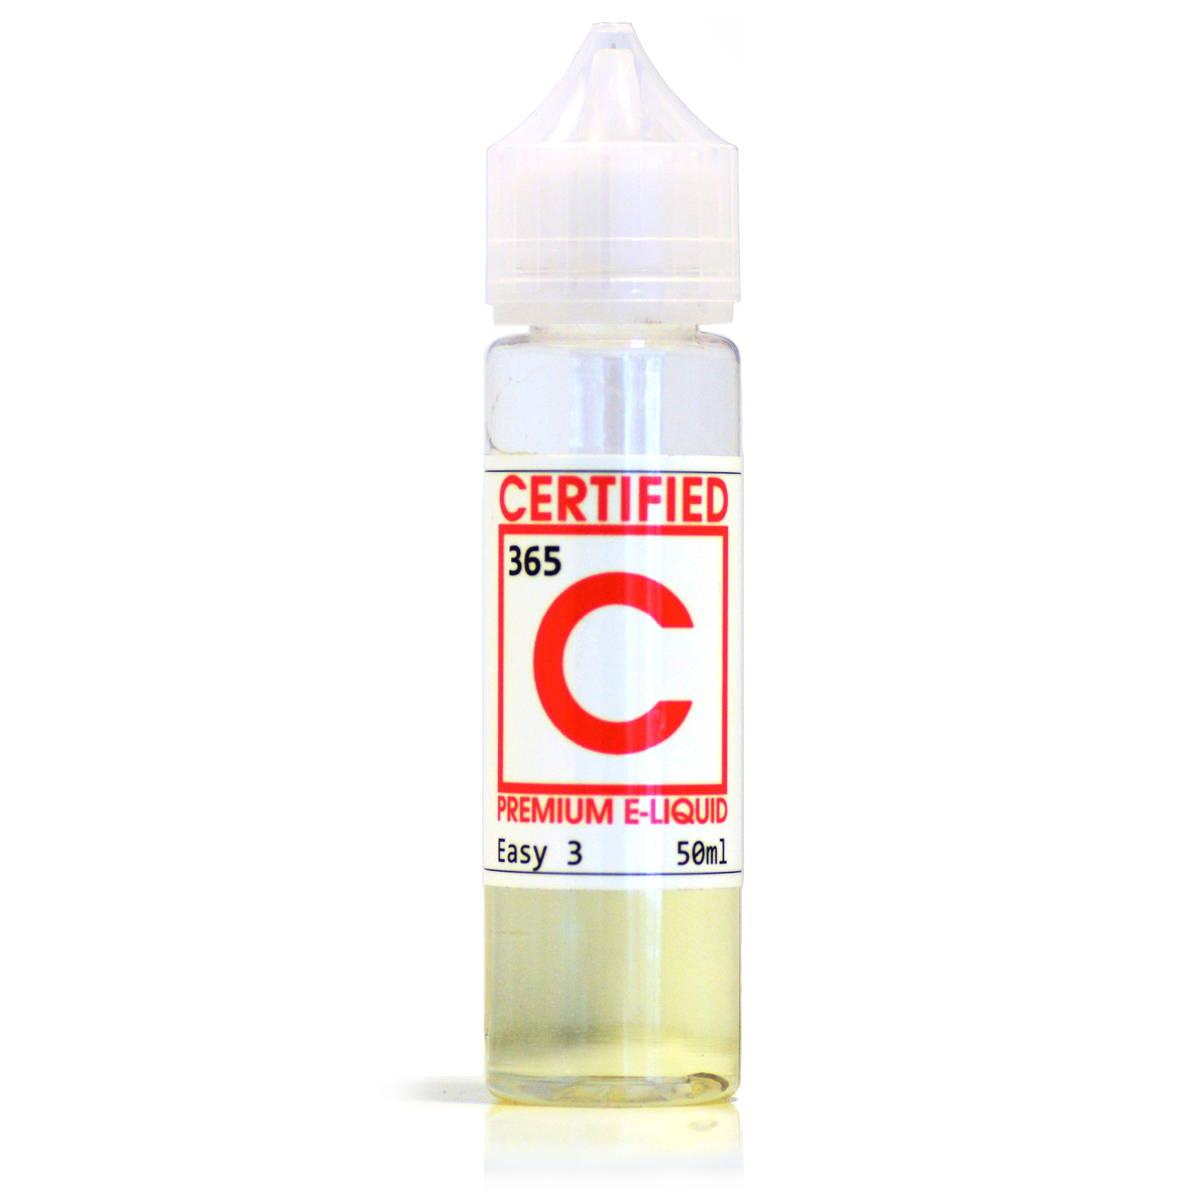 365 vanilla custard E-Liquid by Certified